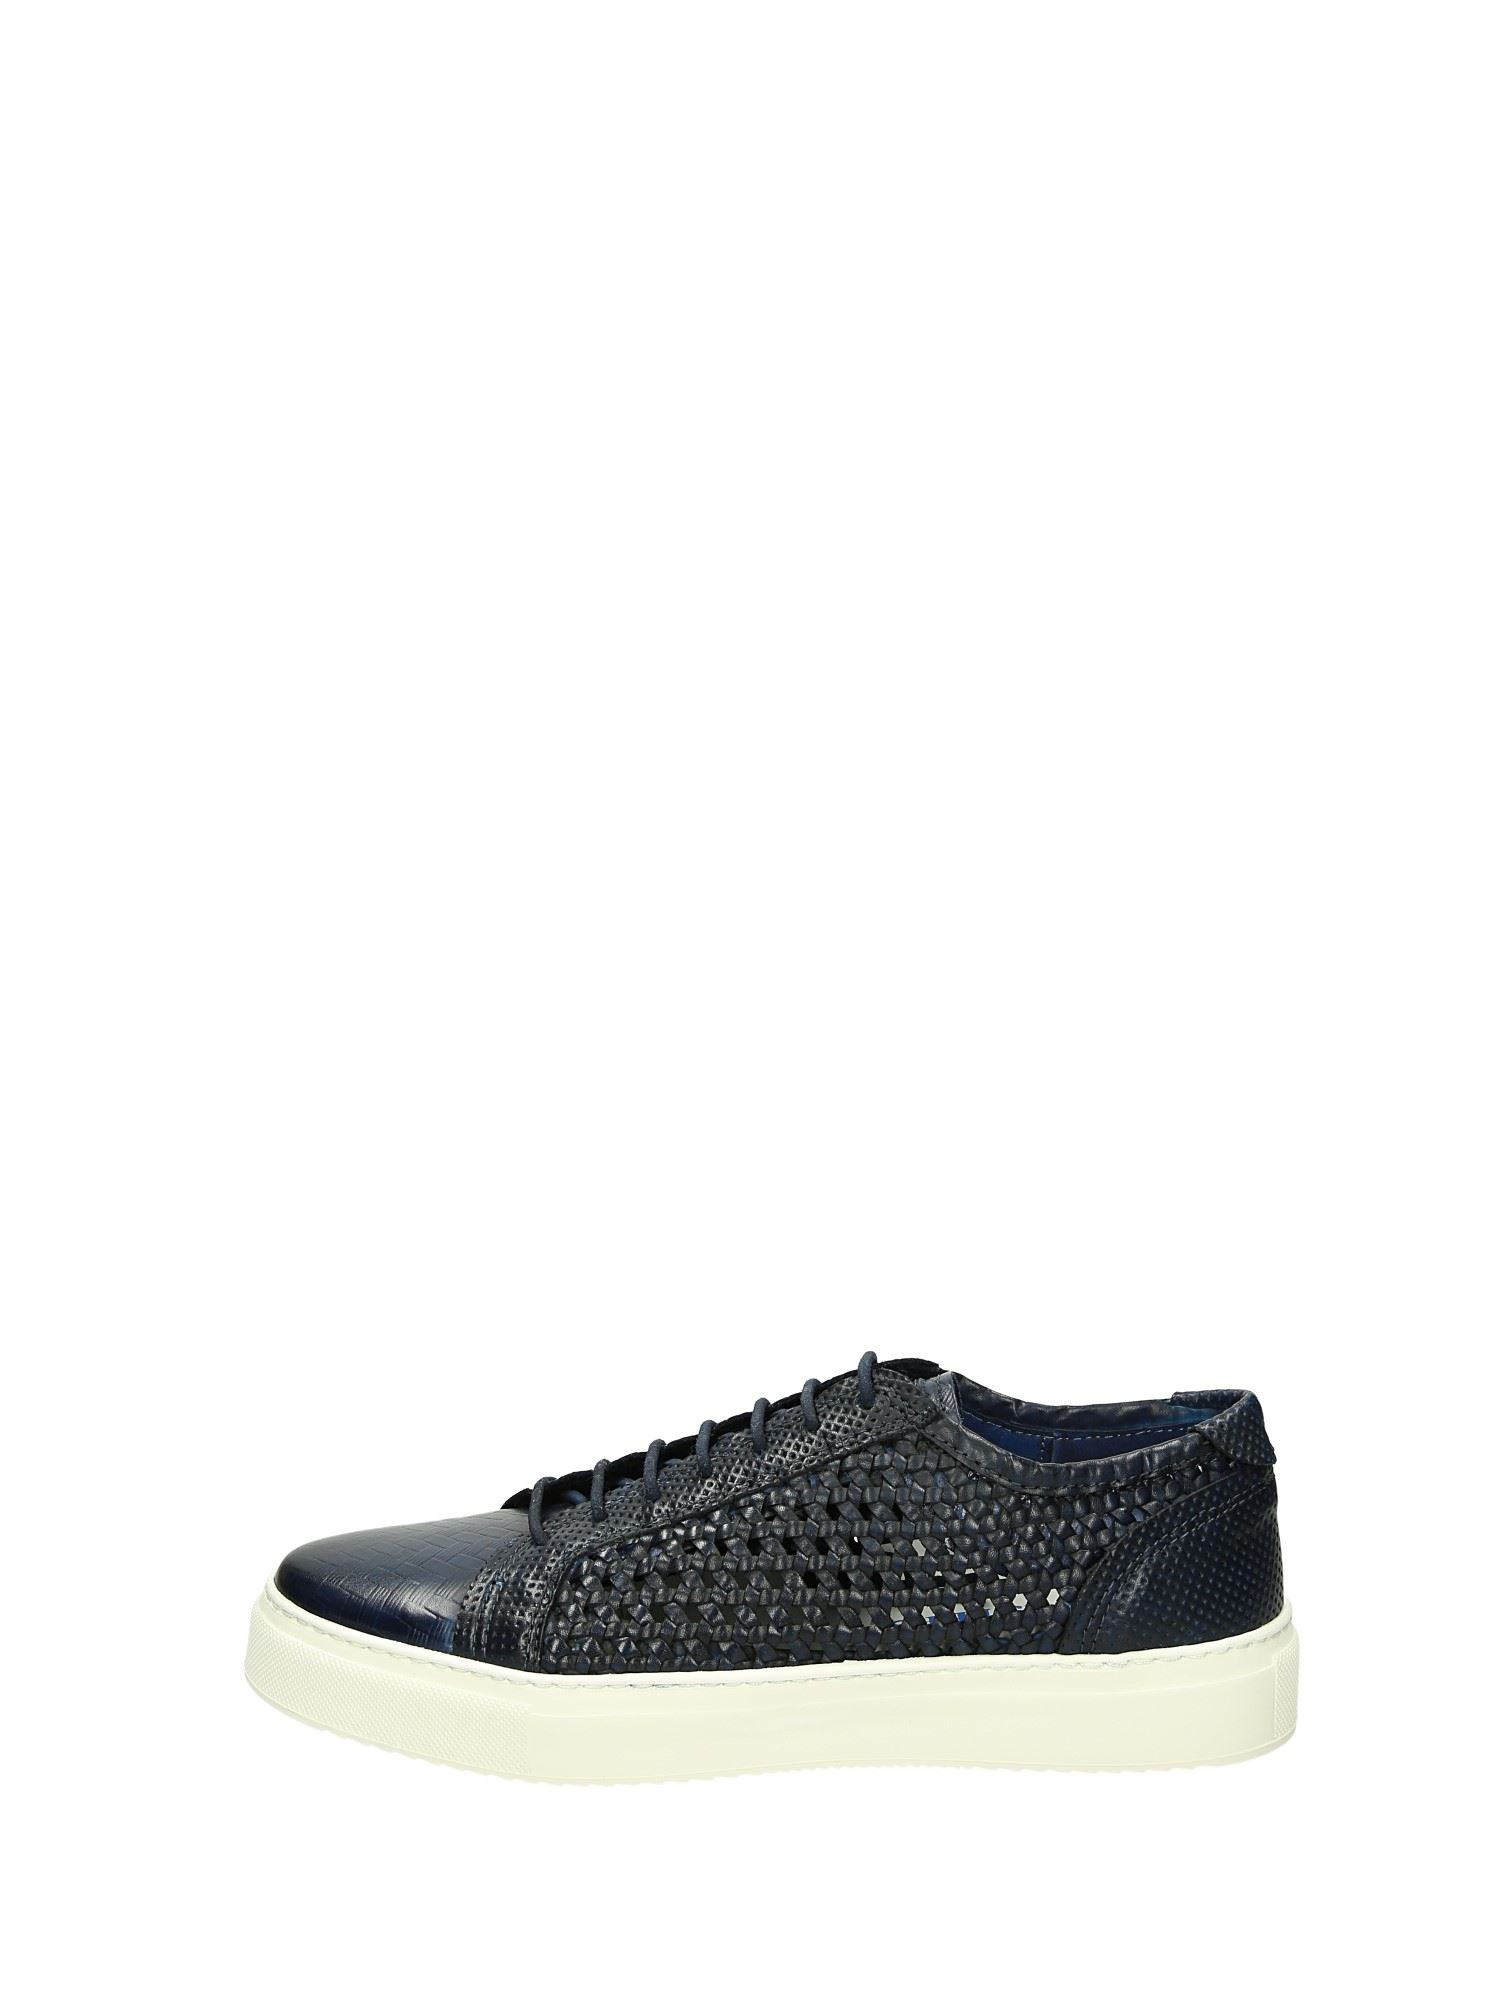 Sneakers BluUomo Lalilina Basse 100Pelle Docksteps l1Fc3KJT